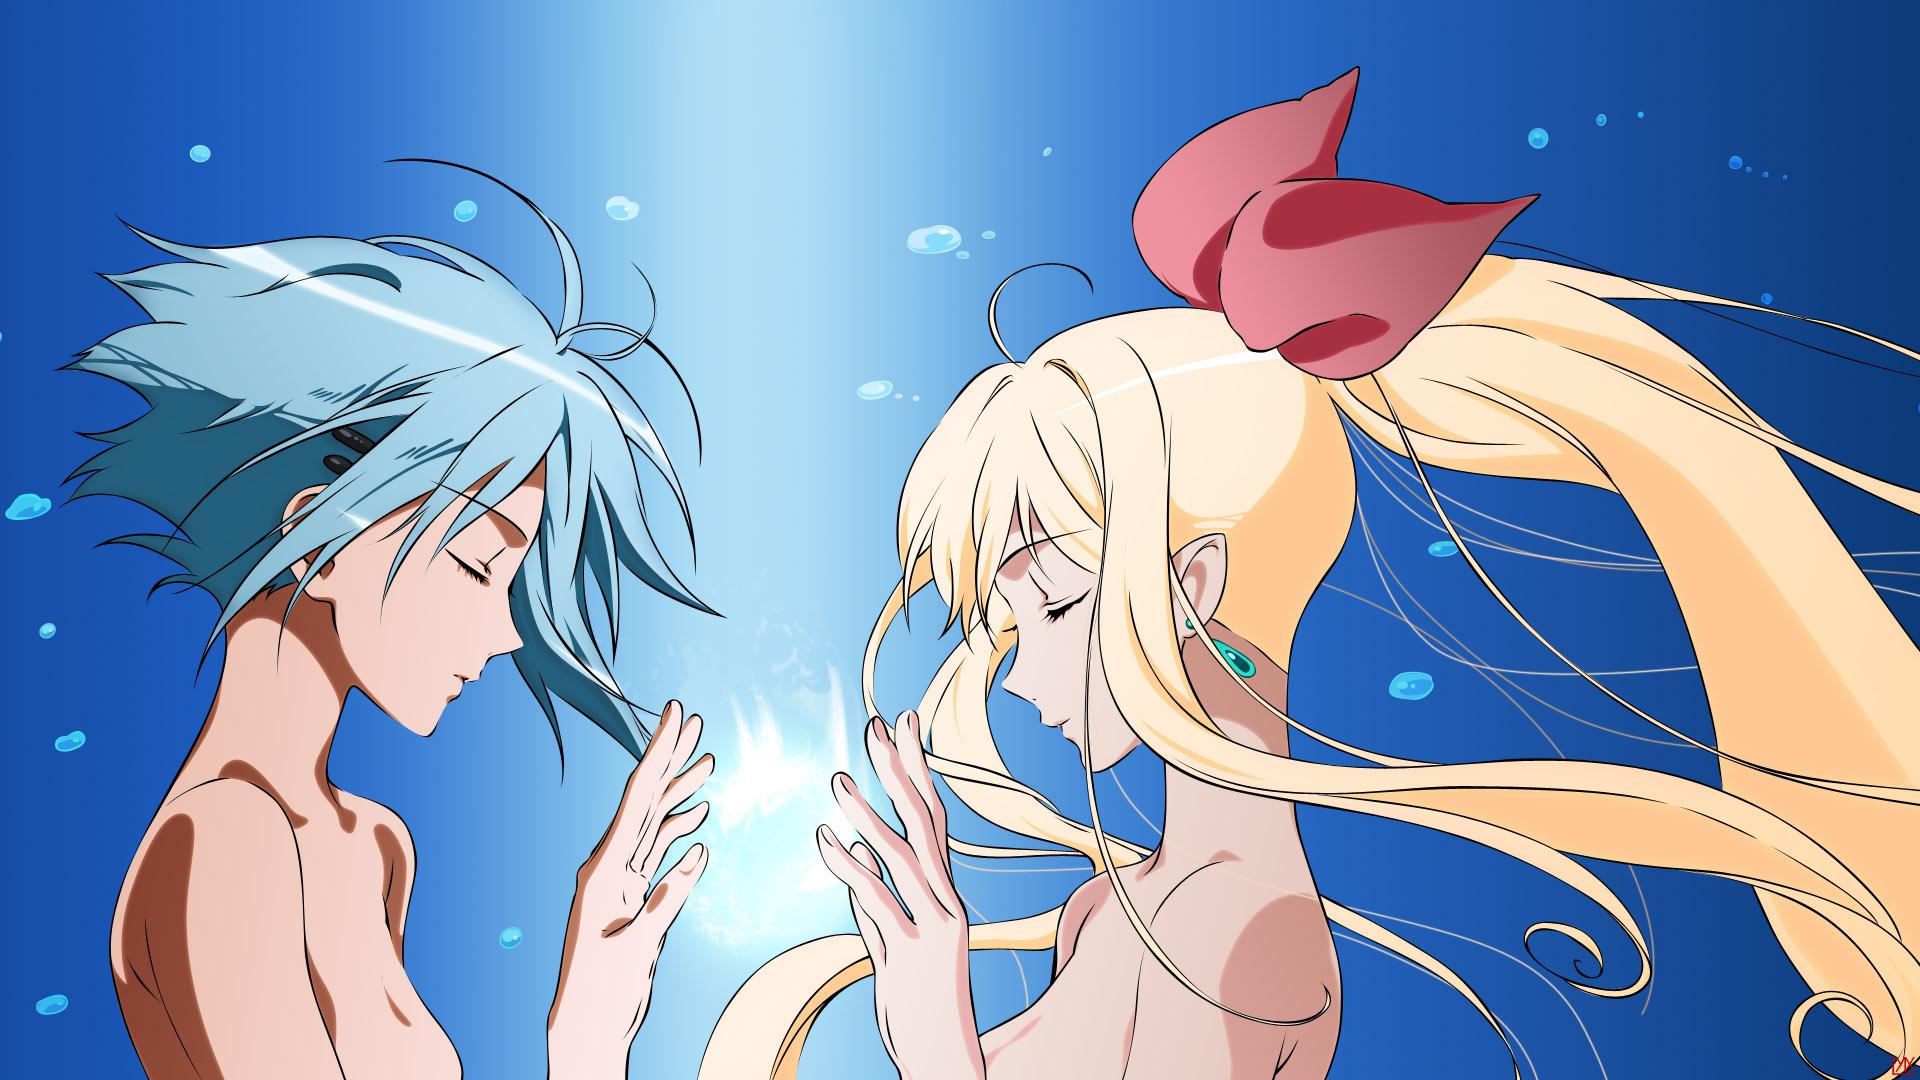 blonde_hair blue_hair long_hair marin miyamori pointed_ears ribbons umi_monogatari vector